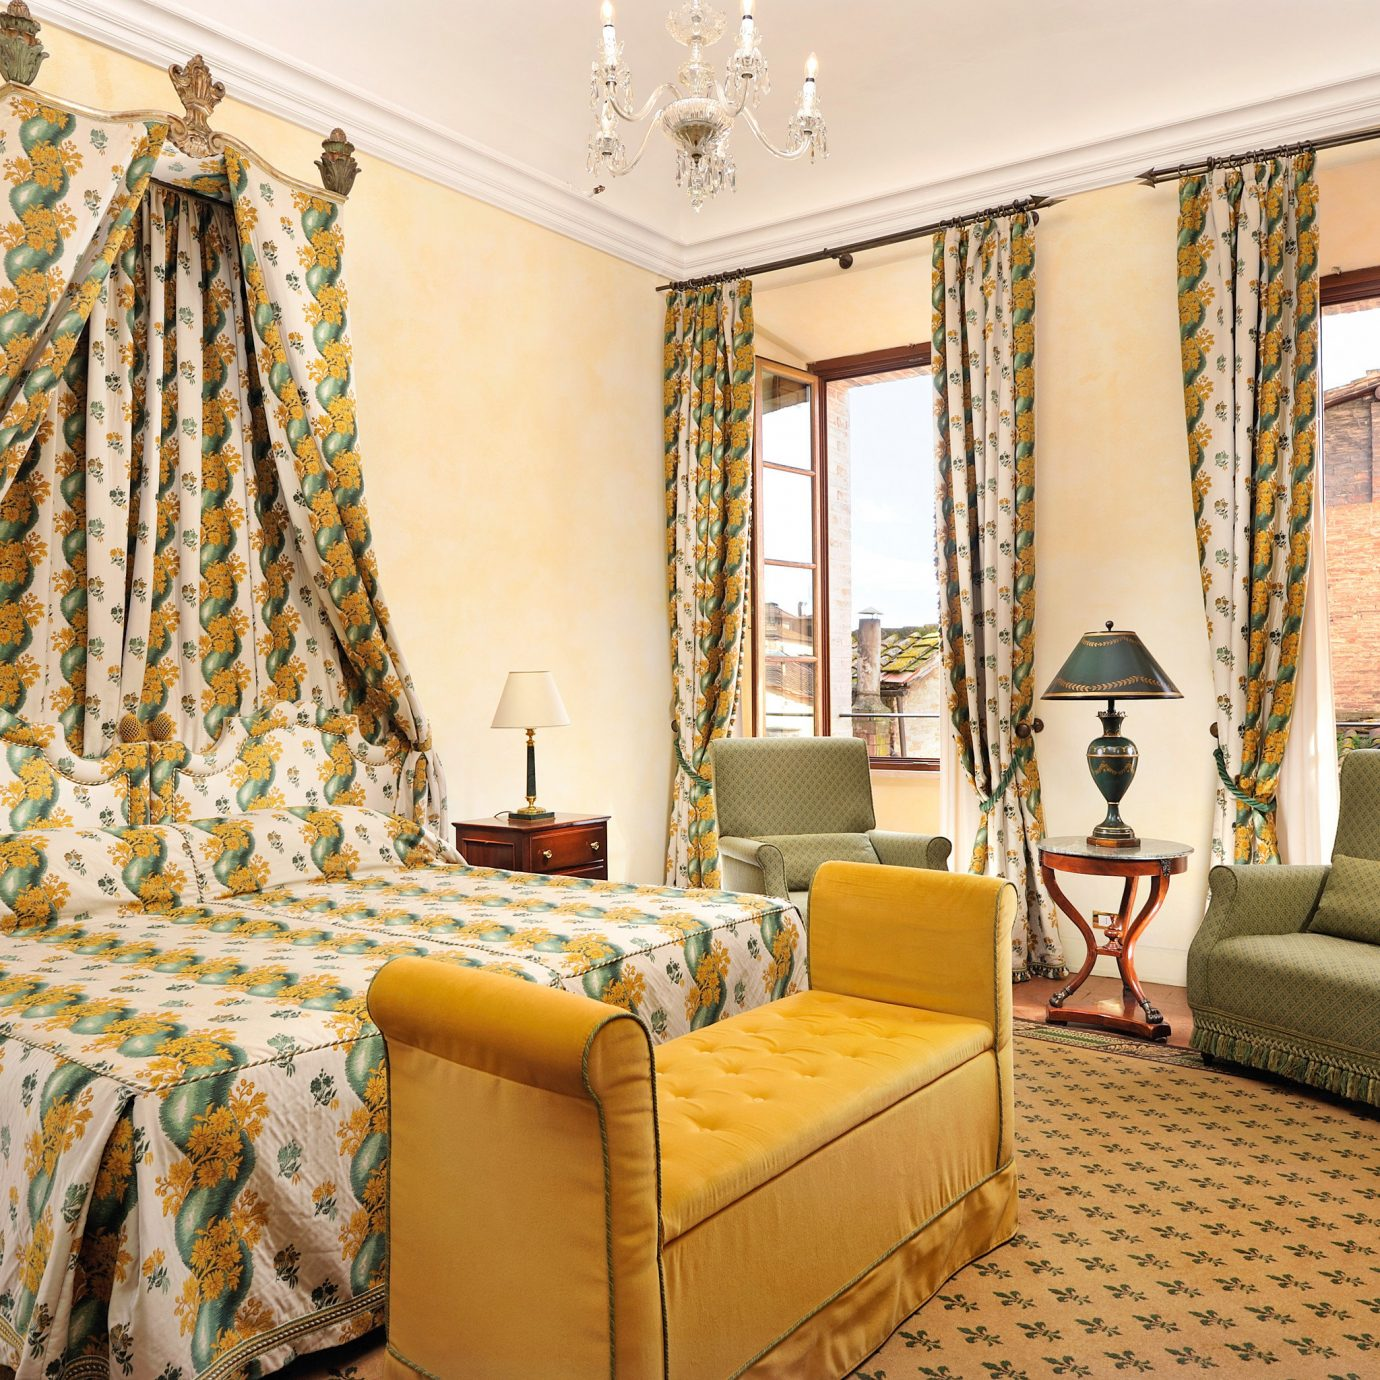 Bedroom Classic Elegant Historic Luxury Romance Romantic property living room home cottage Suite